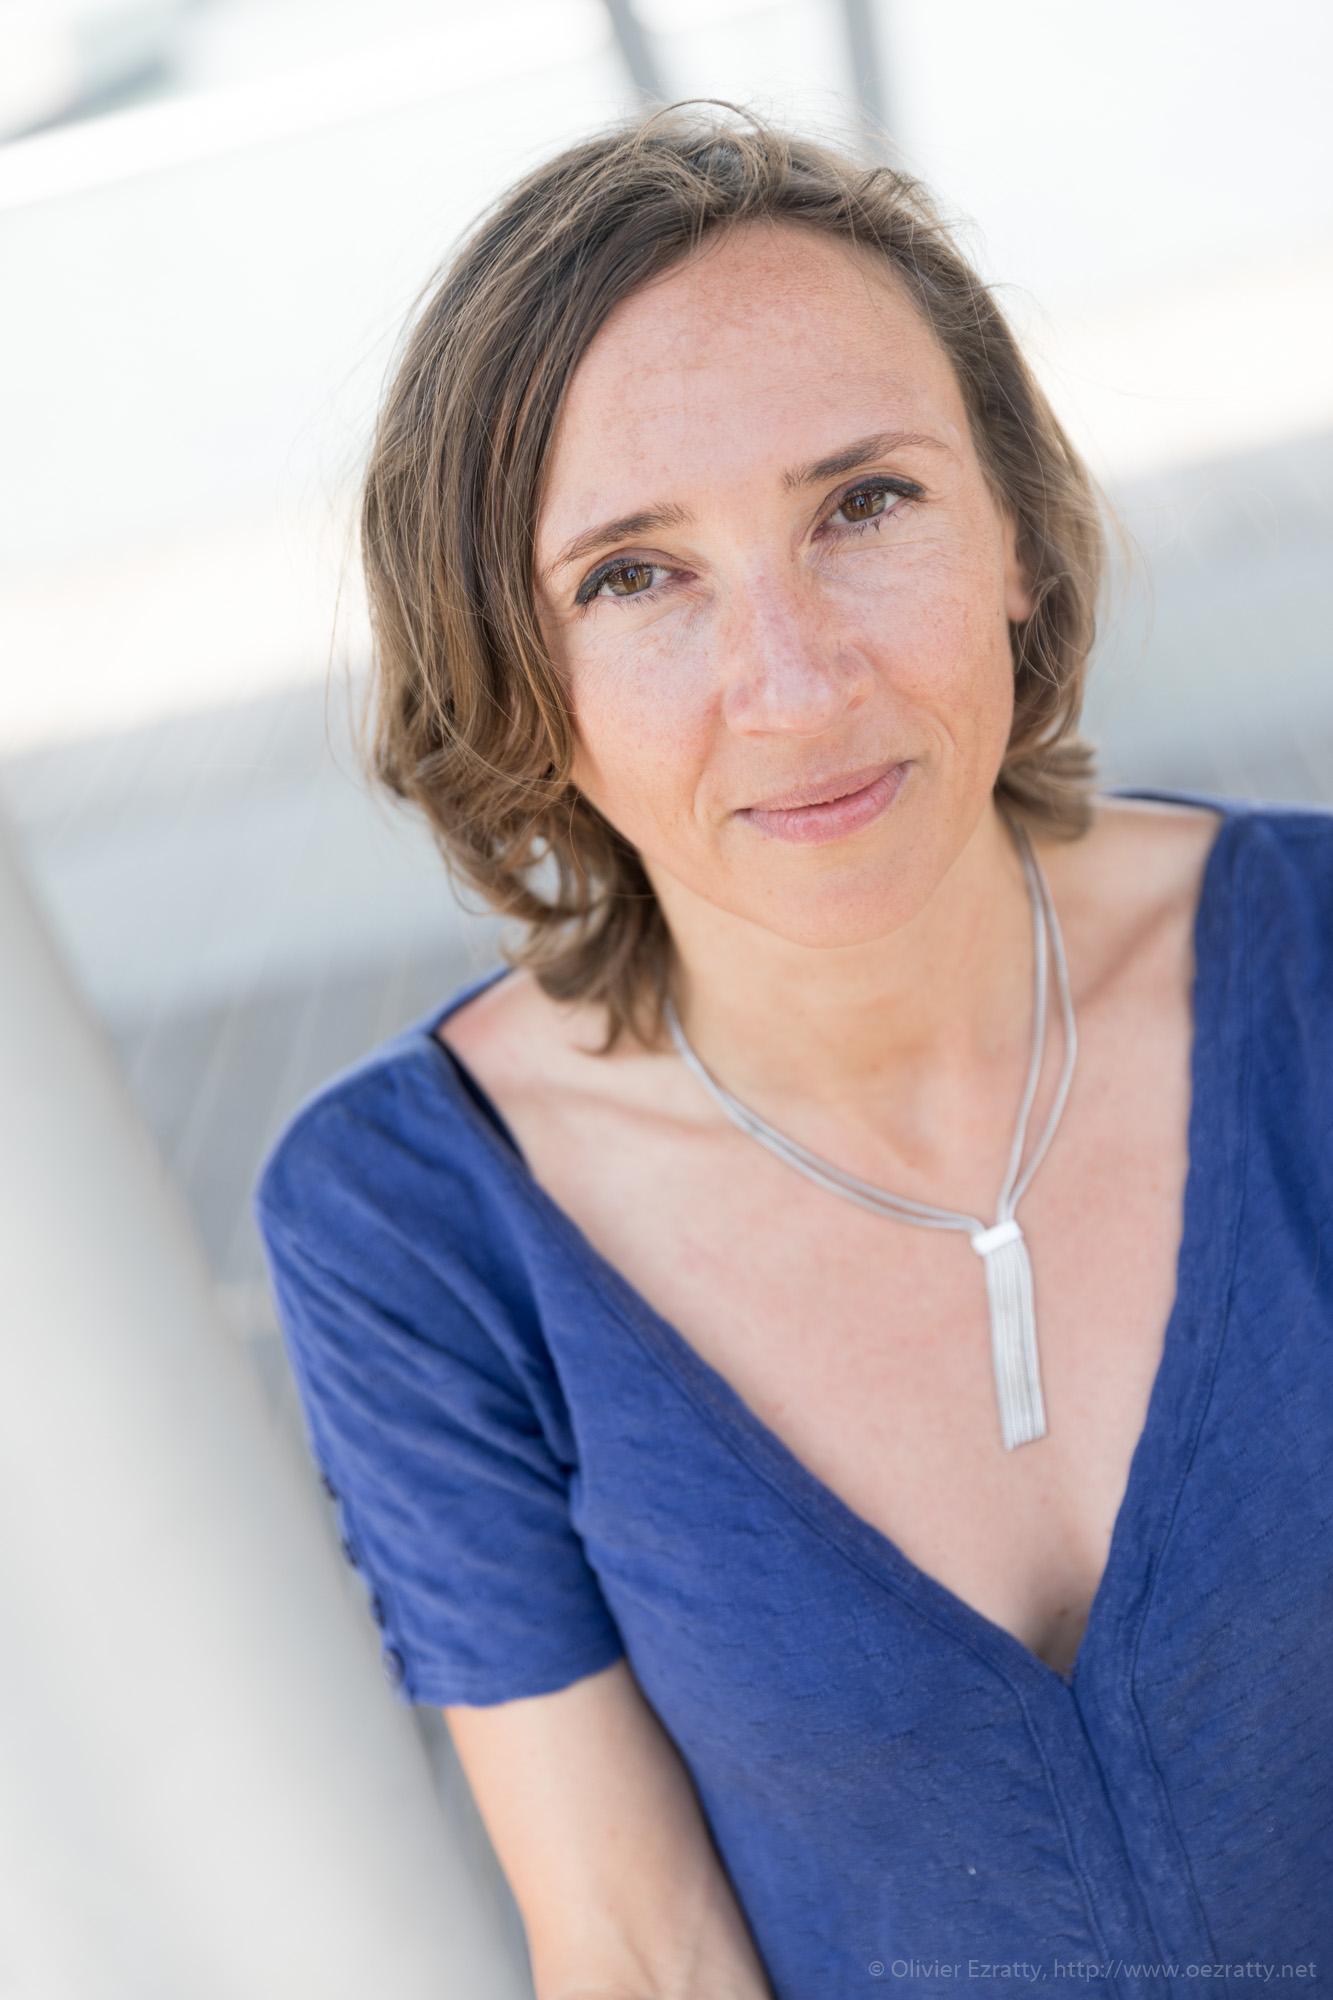 Alexia Auffeves, Directrice de Recherche CNRS, coordinatrice de Quantum Engineering Grenoble